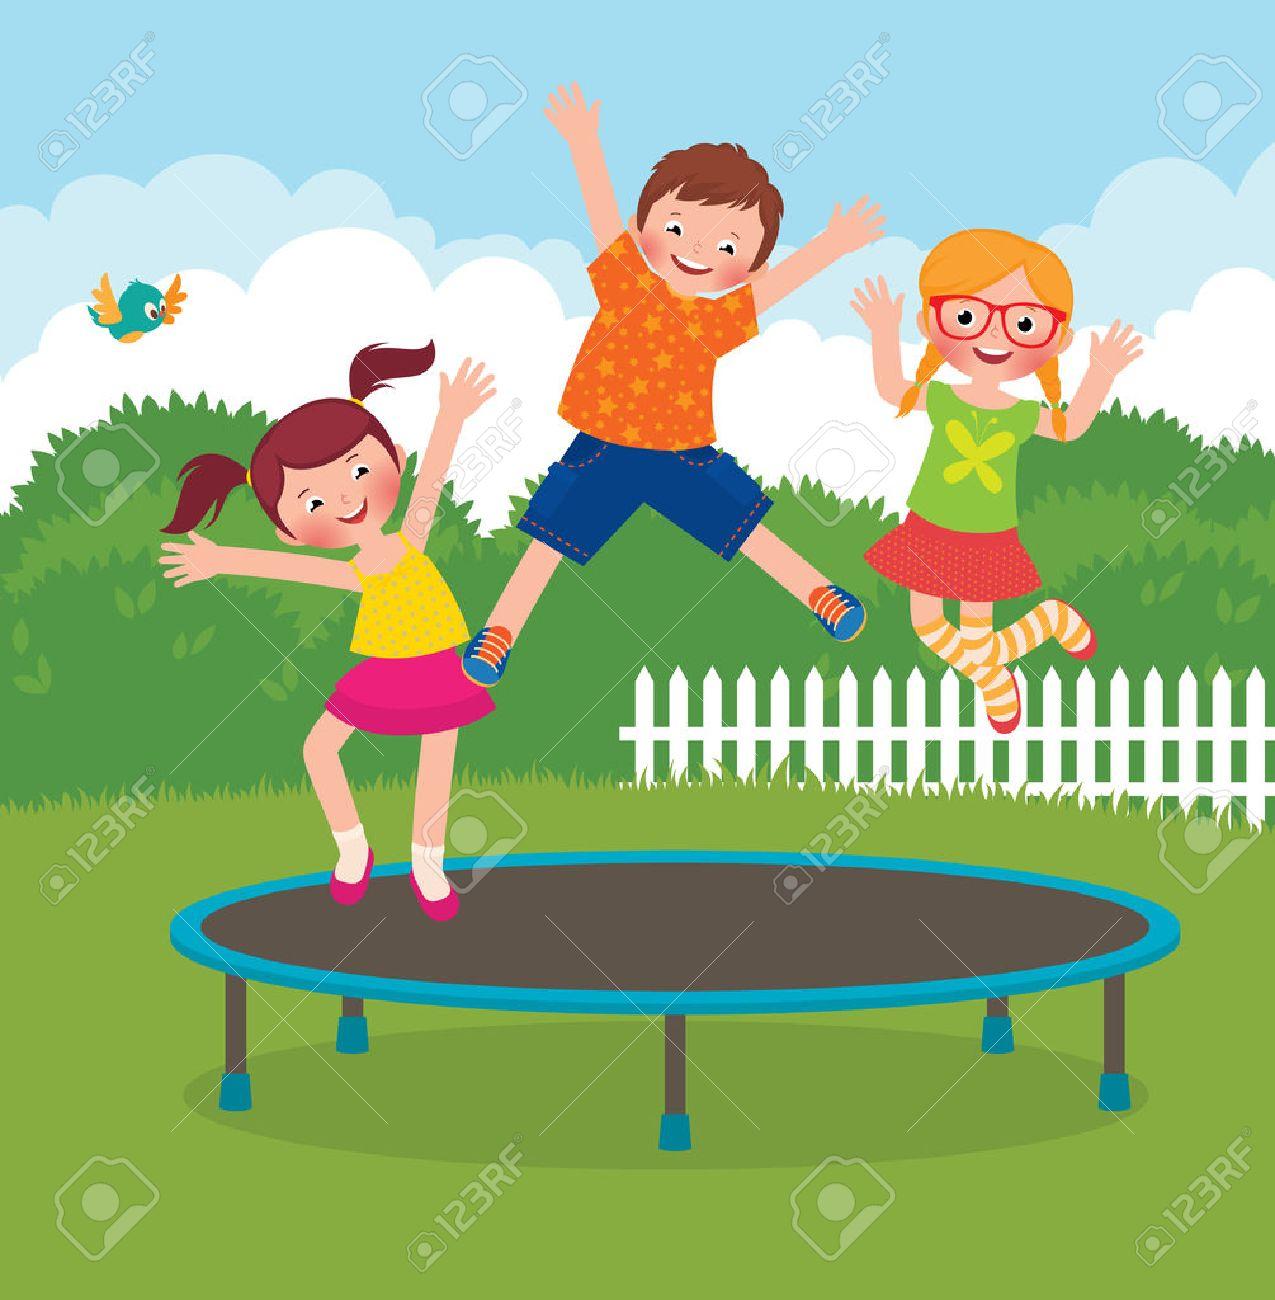 Stock Vector cartoon illustration of funny children jumping on a trampoline - 35804199